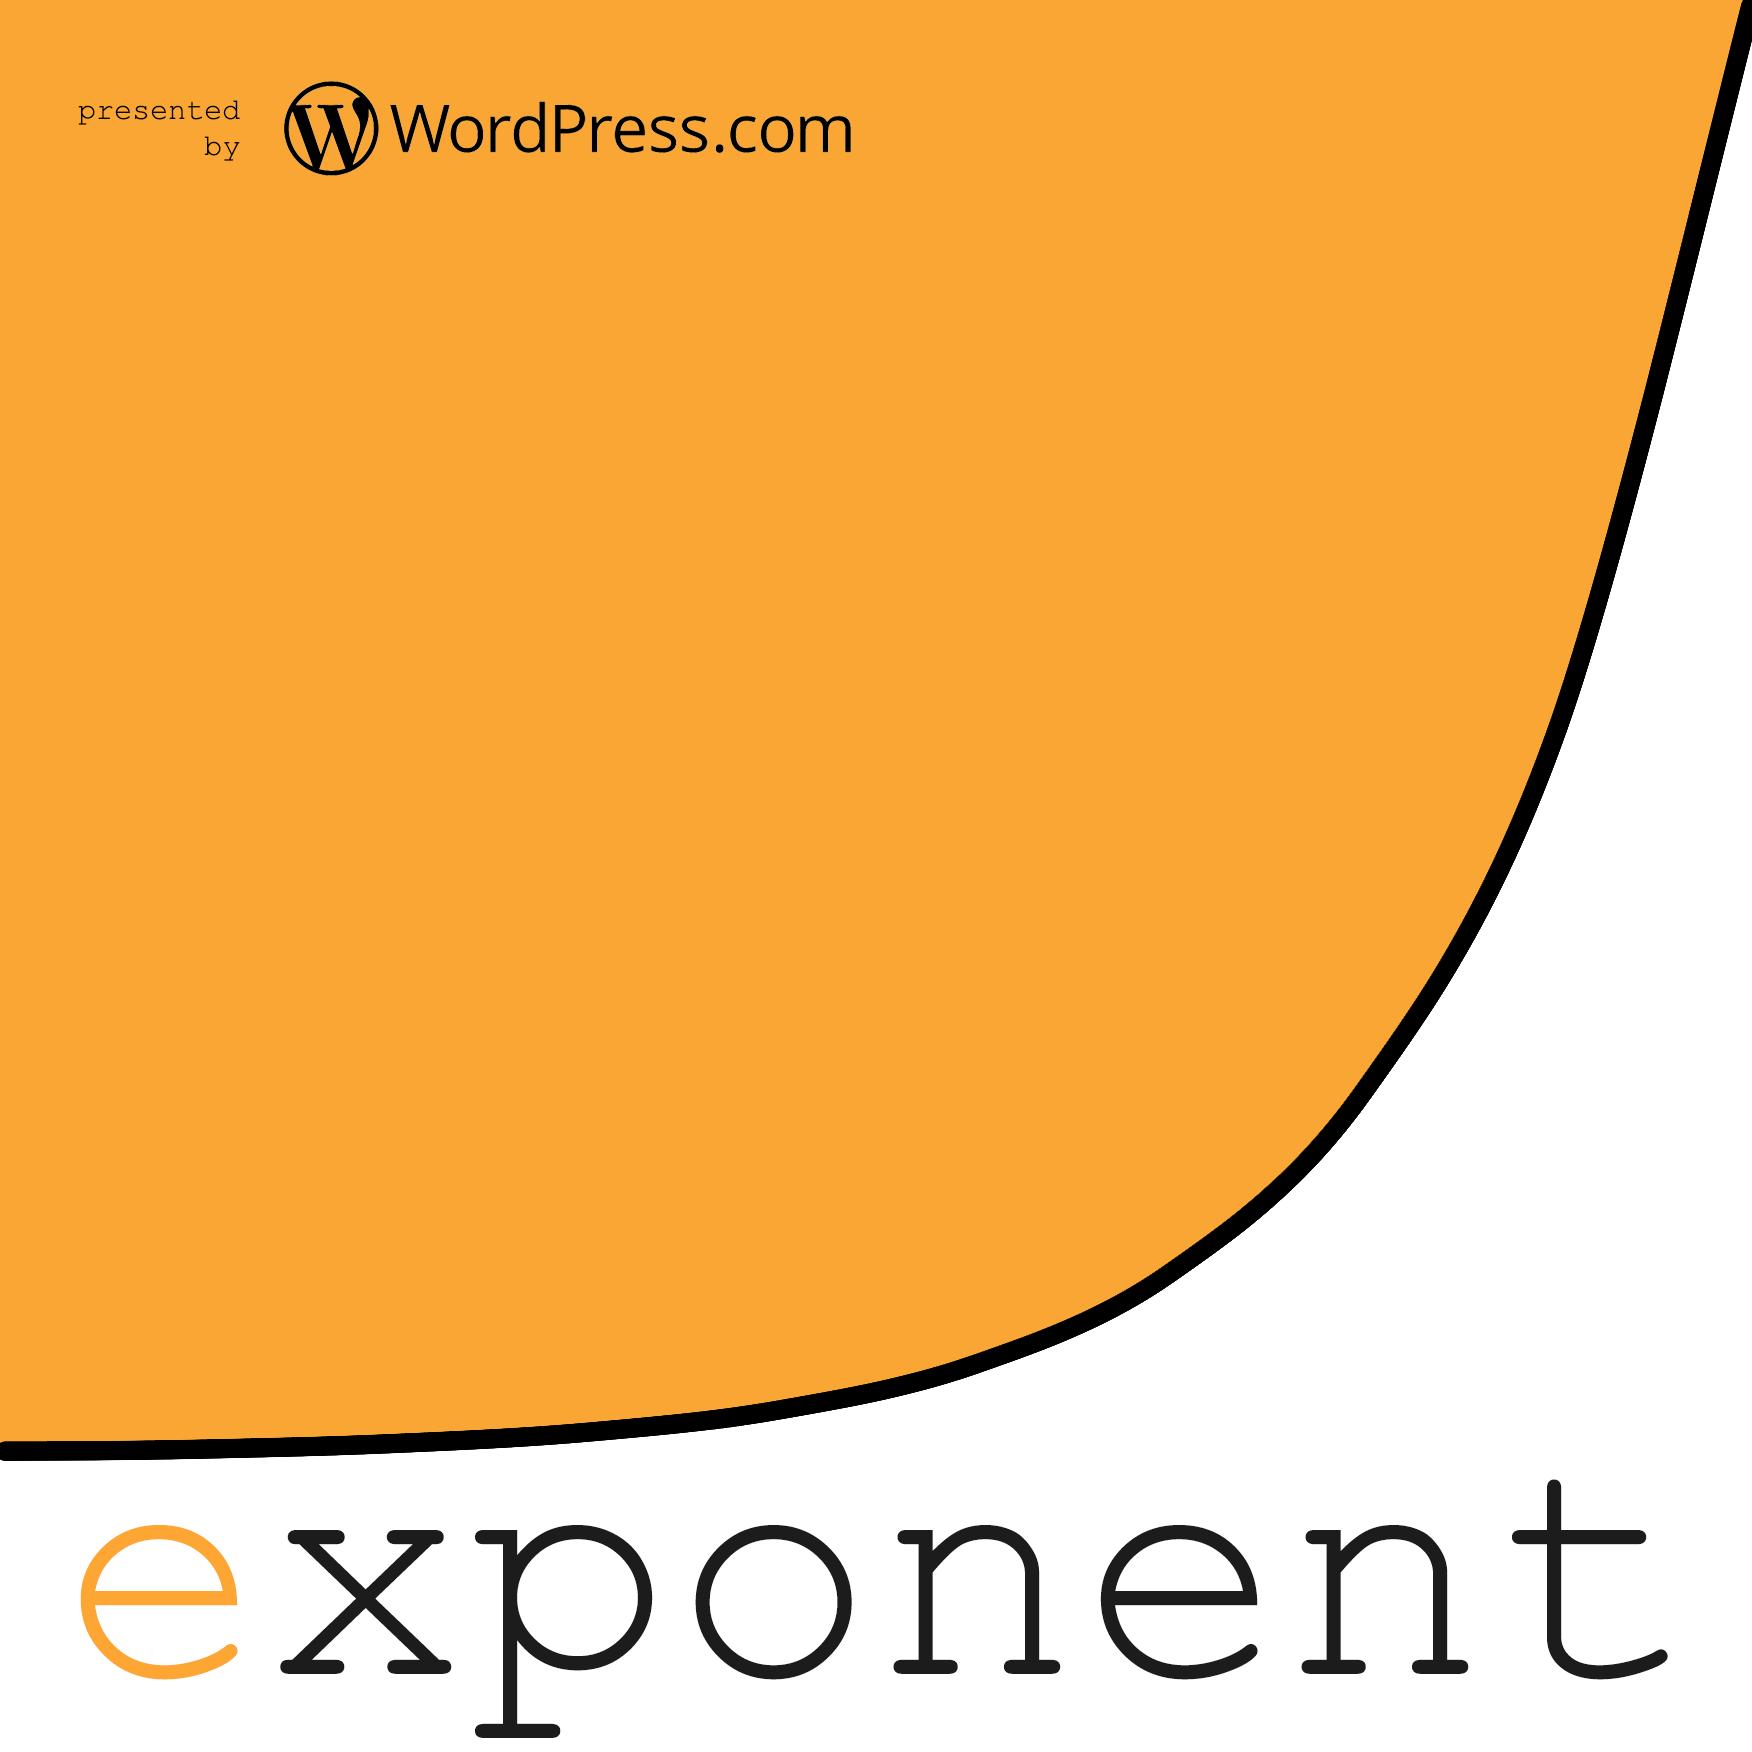 Exponent-3-wp.png